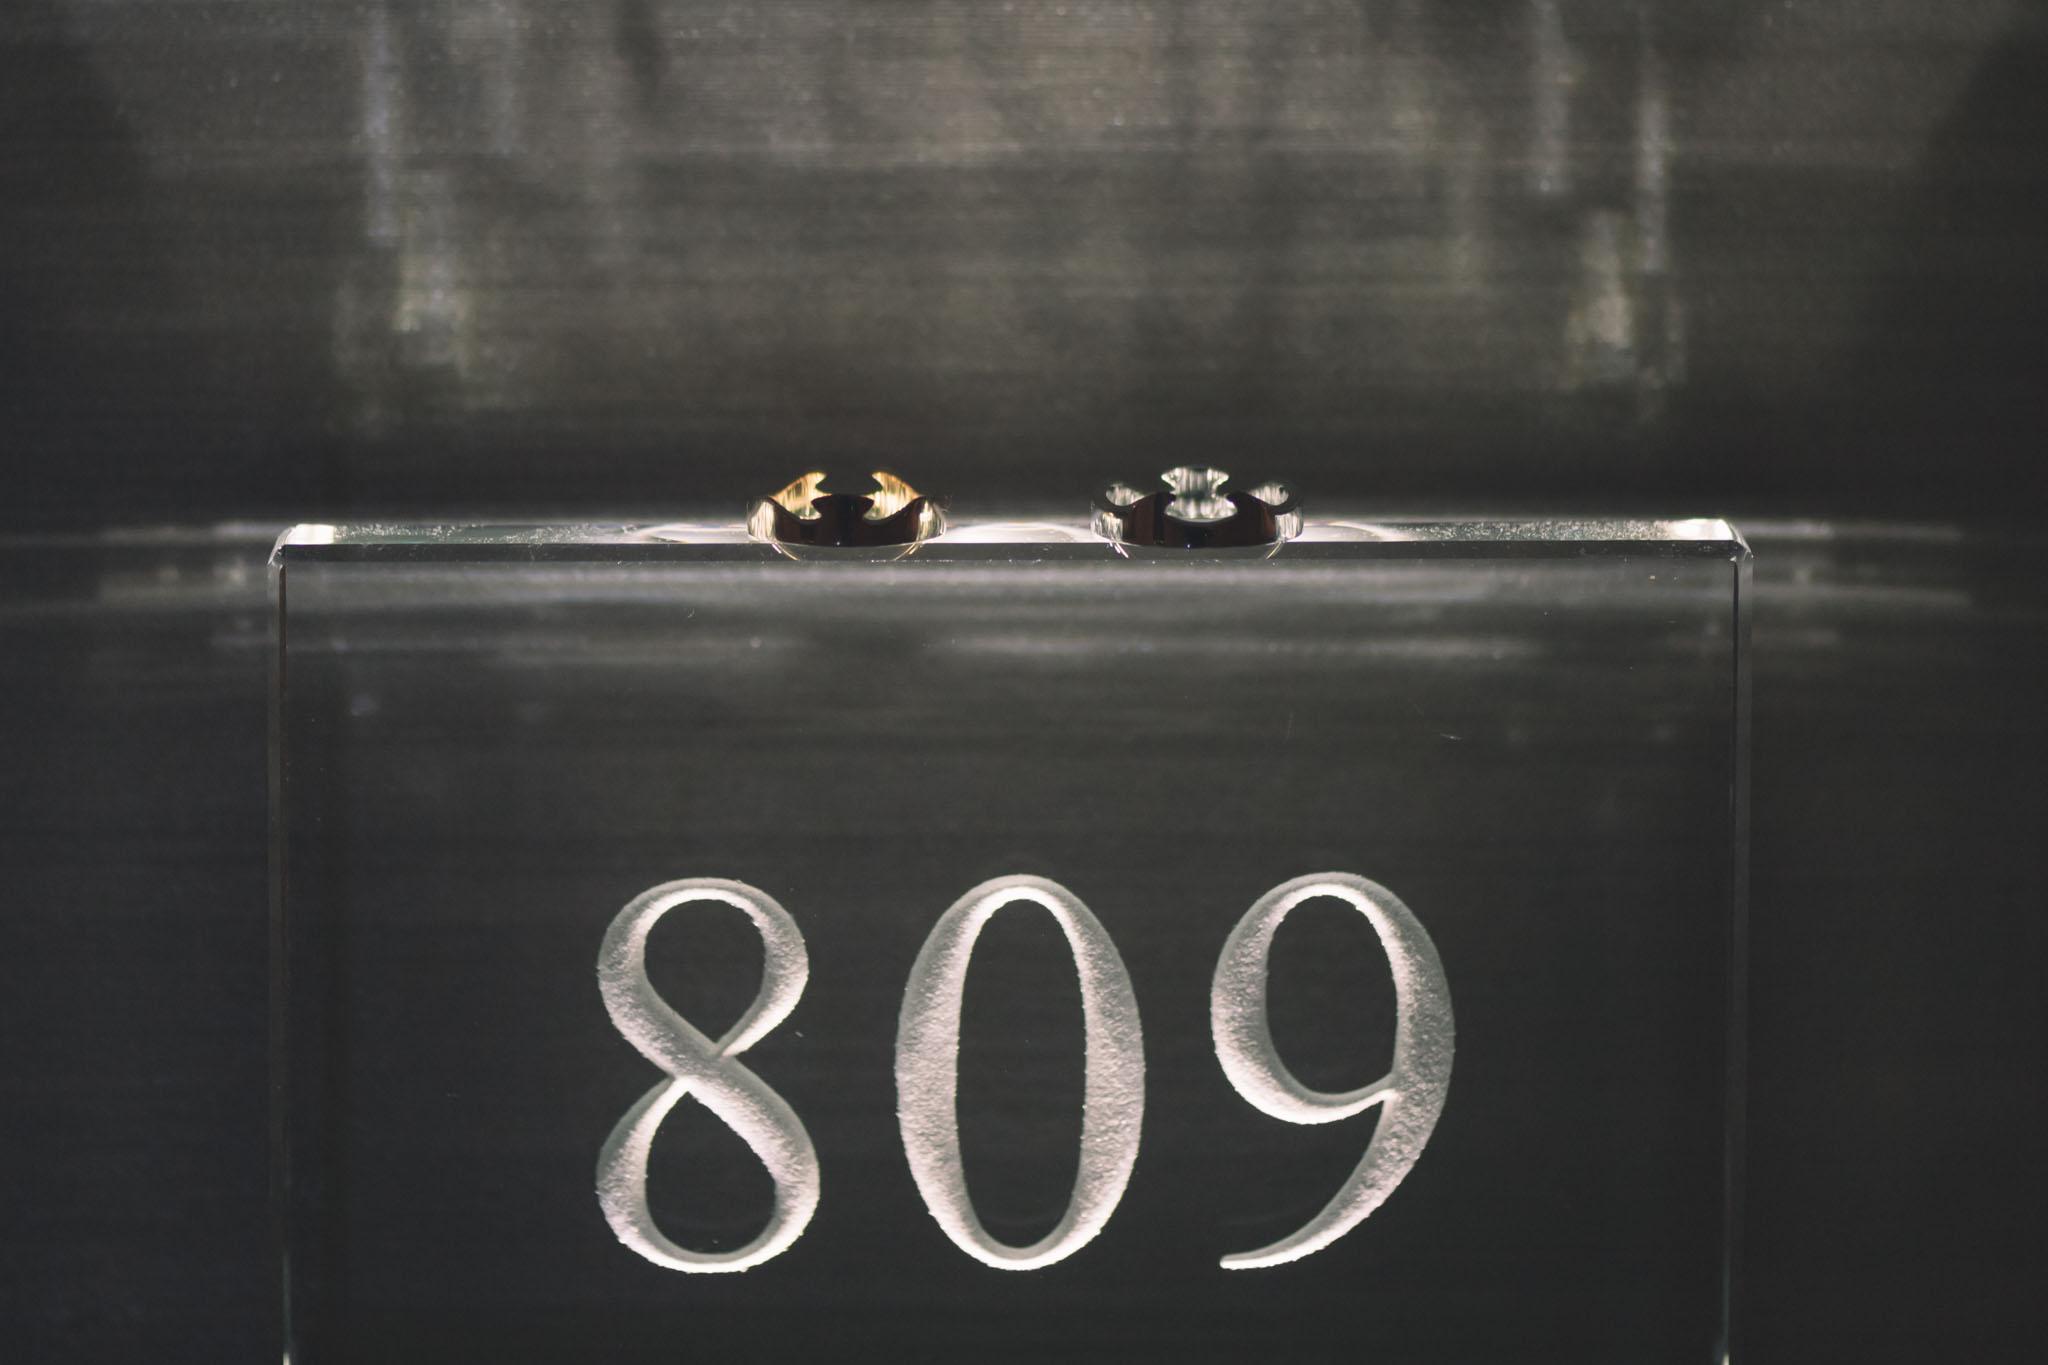 D-005